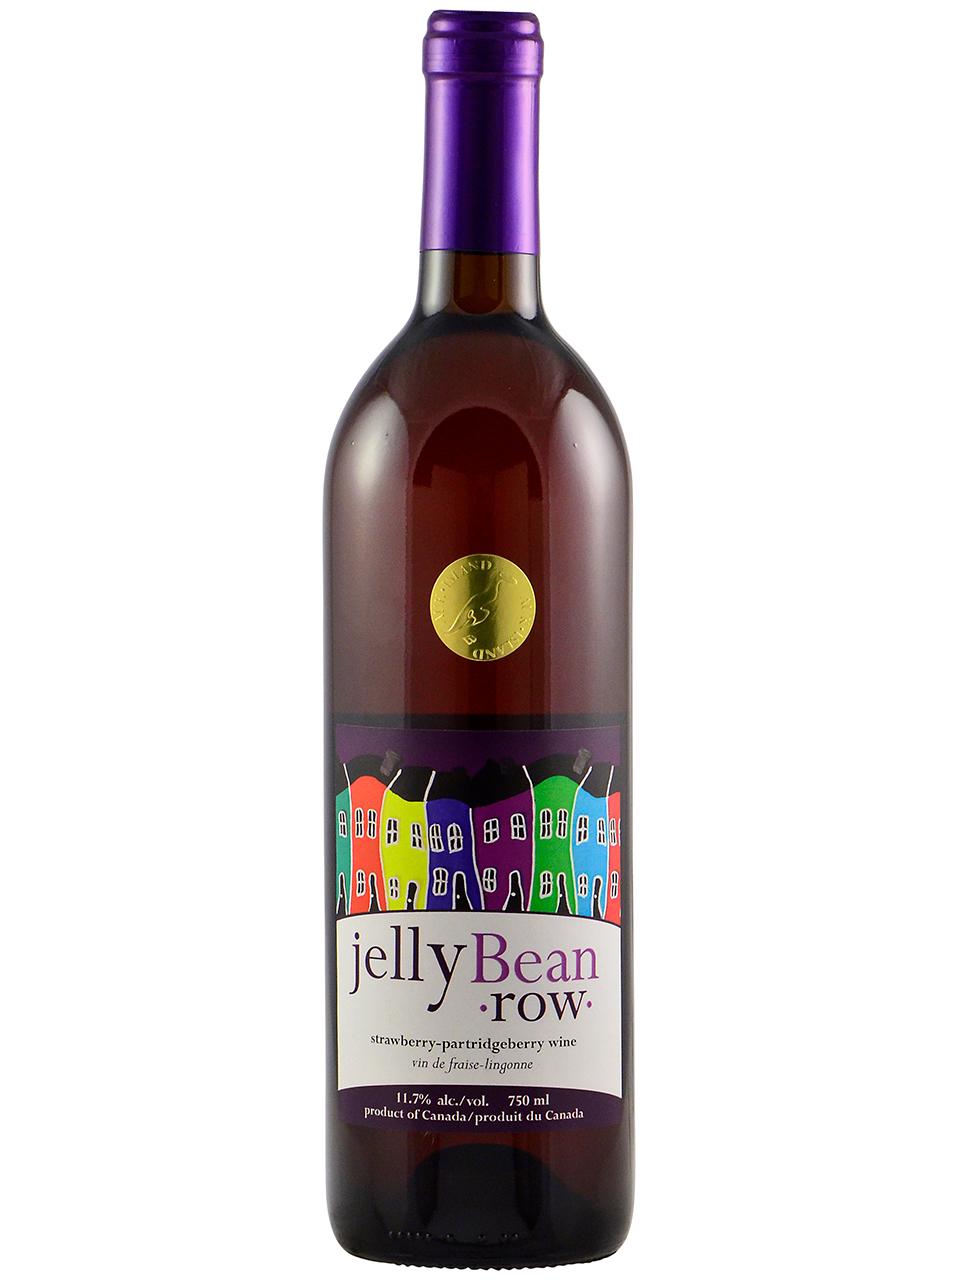 Jellybean Row Strawberry/Partridgeberry